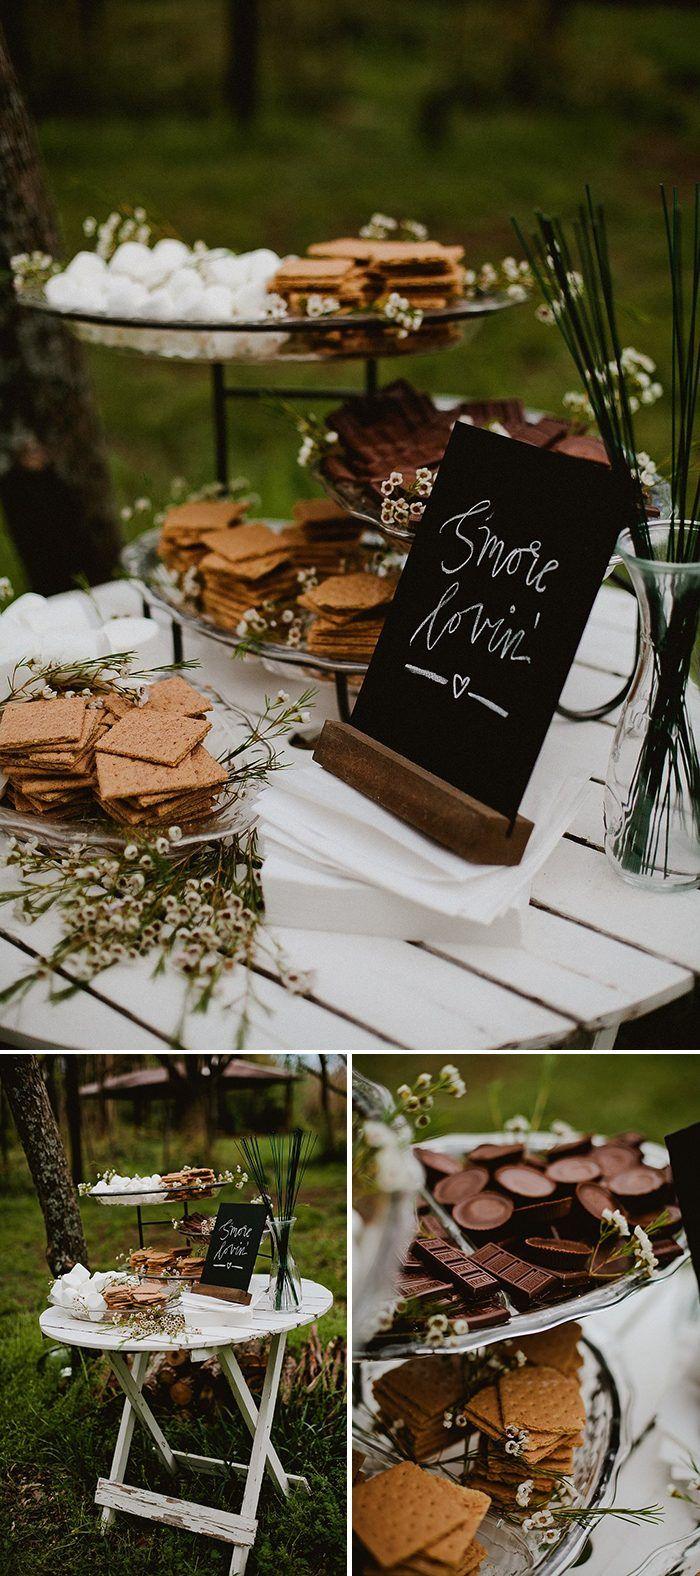 10 Ways to Create a Cozy Wedding Reception